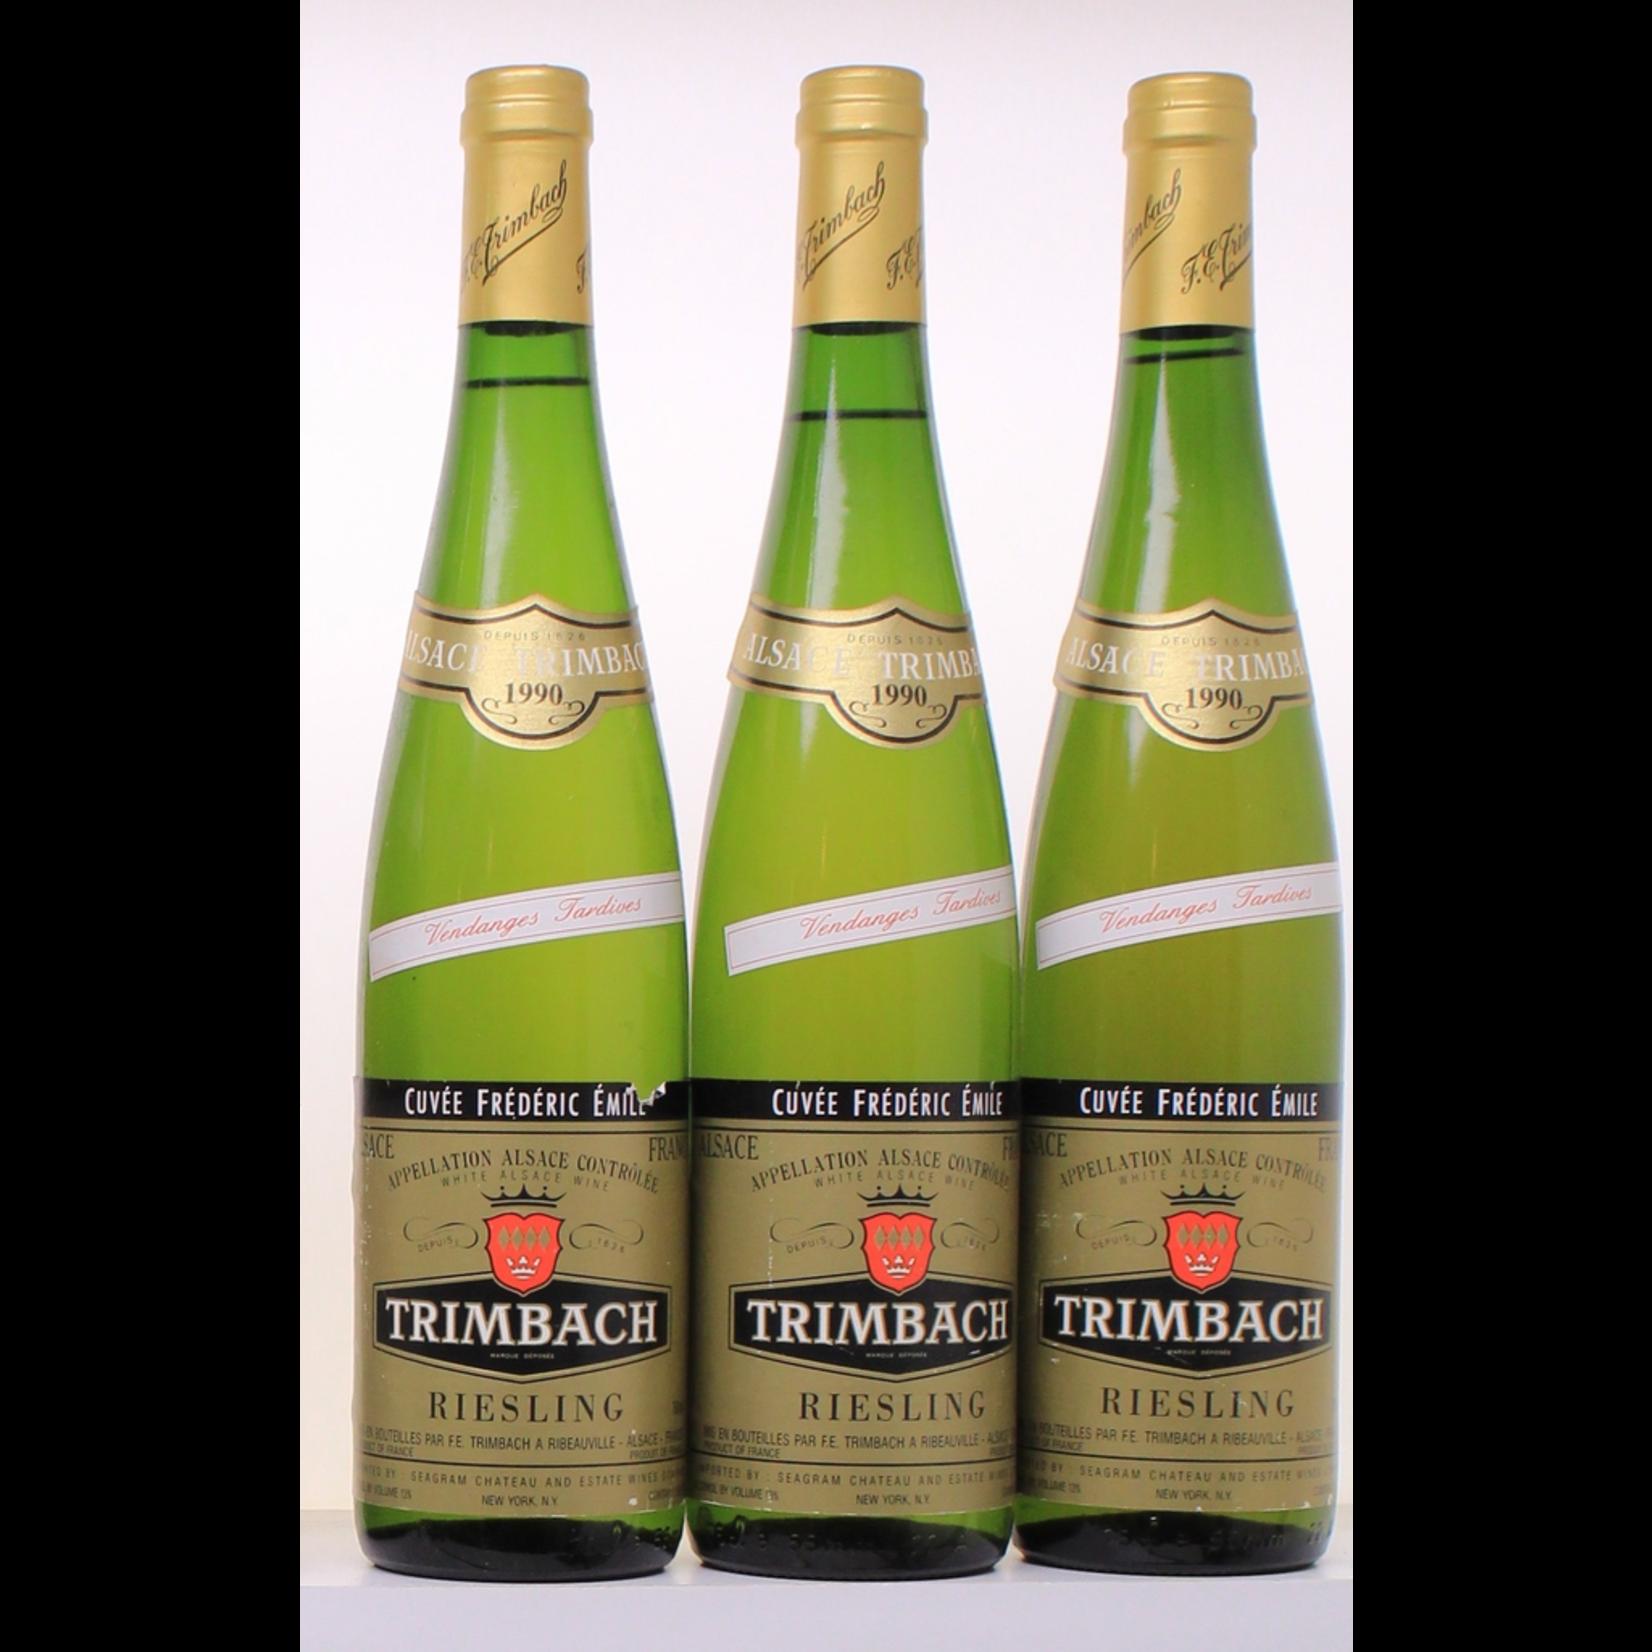 Wine Trimbach Riesling Cuvee Frederic Emile Vendanges Tardives 1990